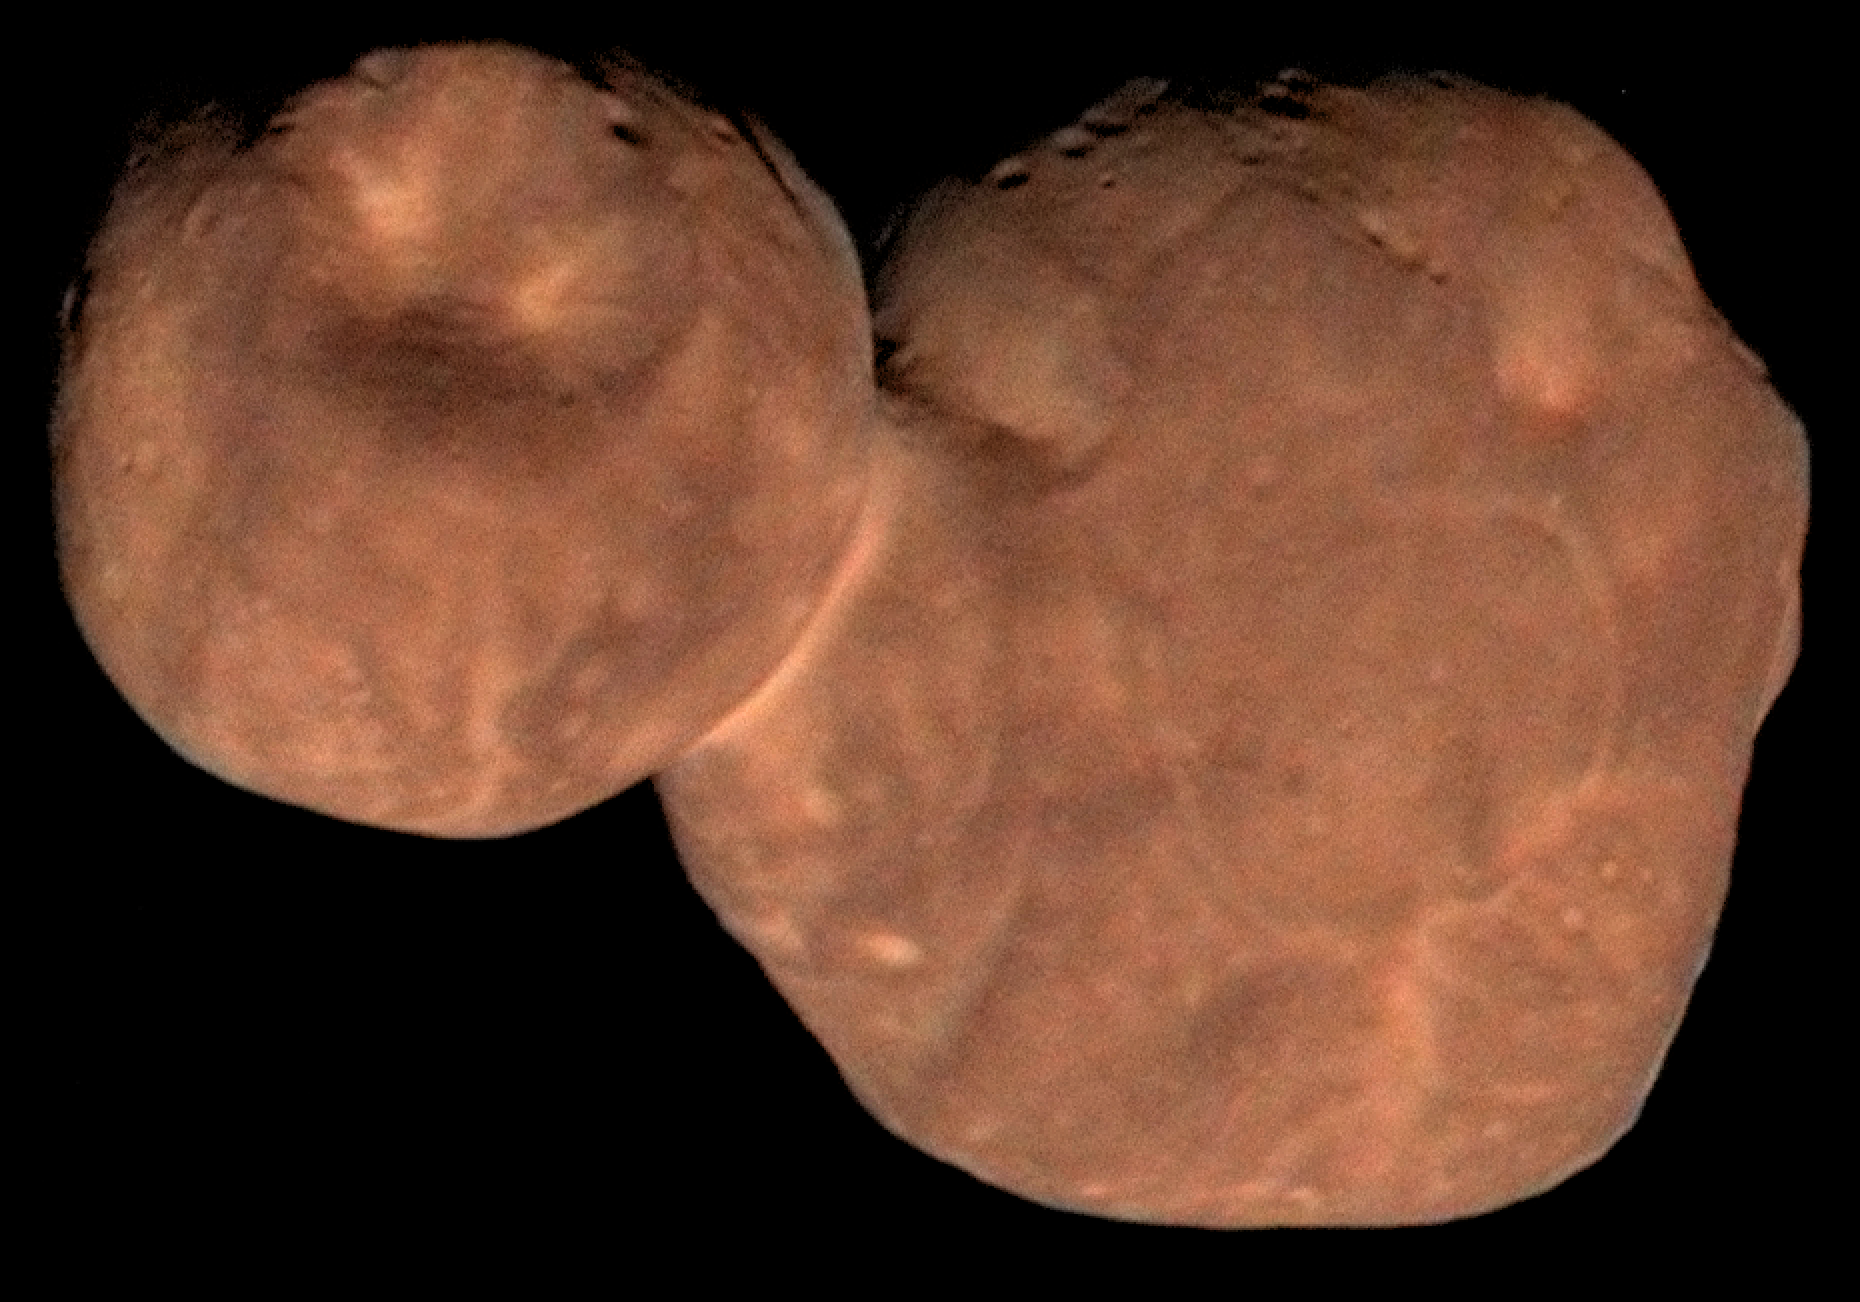 Classical Kuiper belt object - Wikipedia